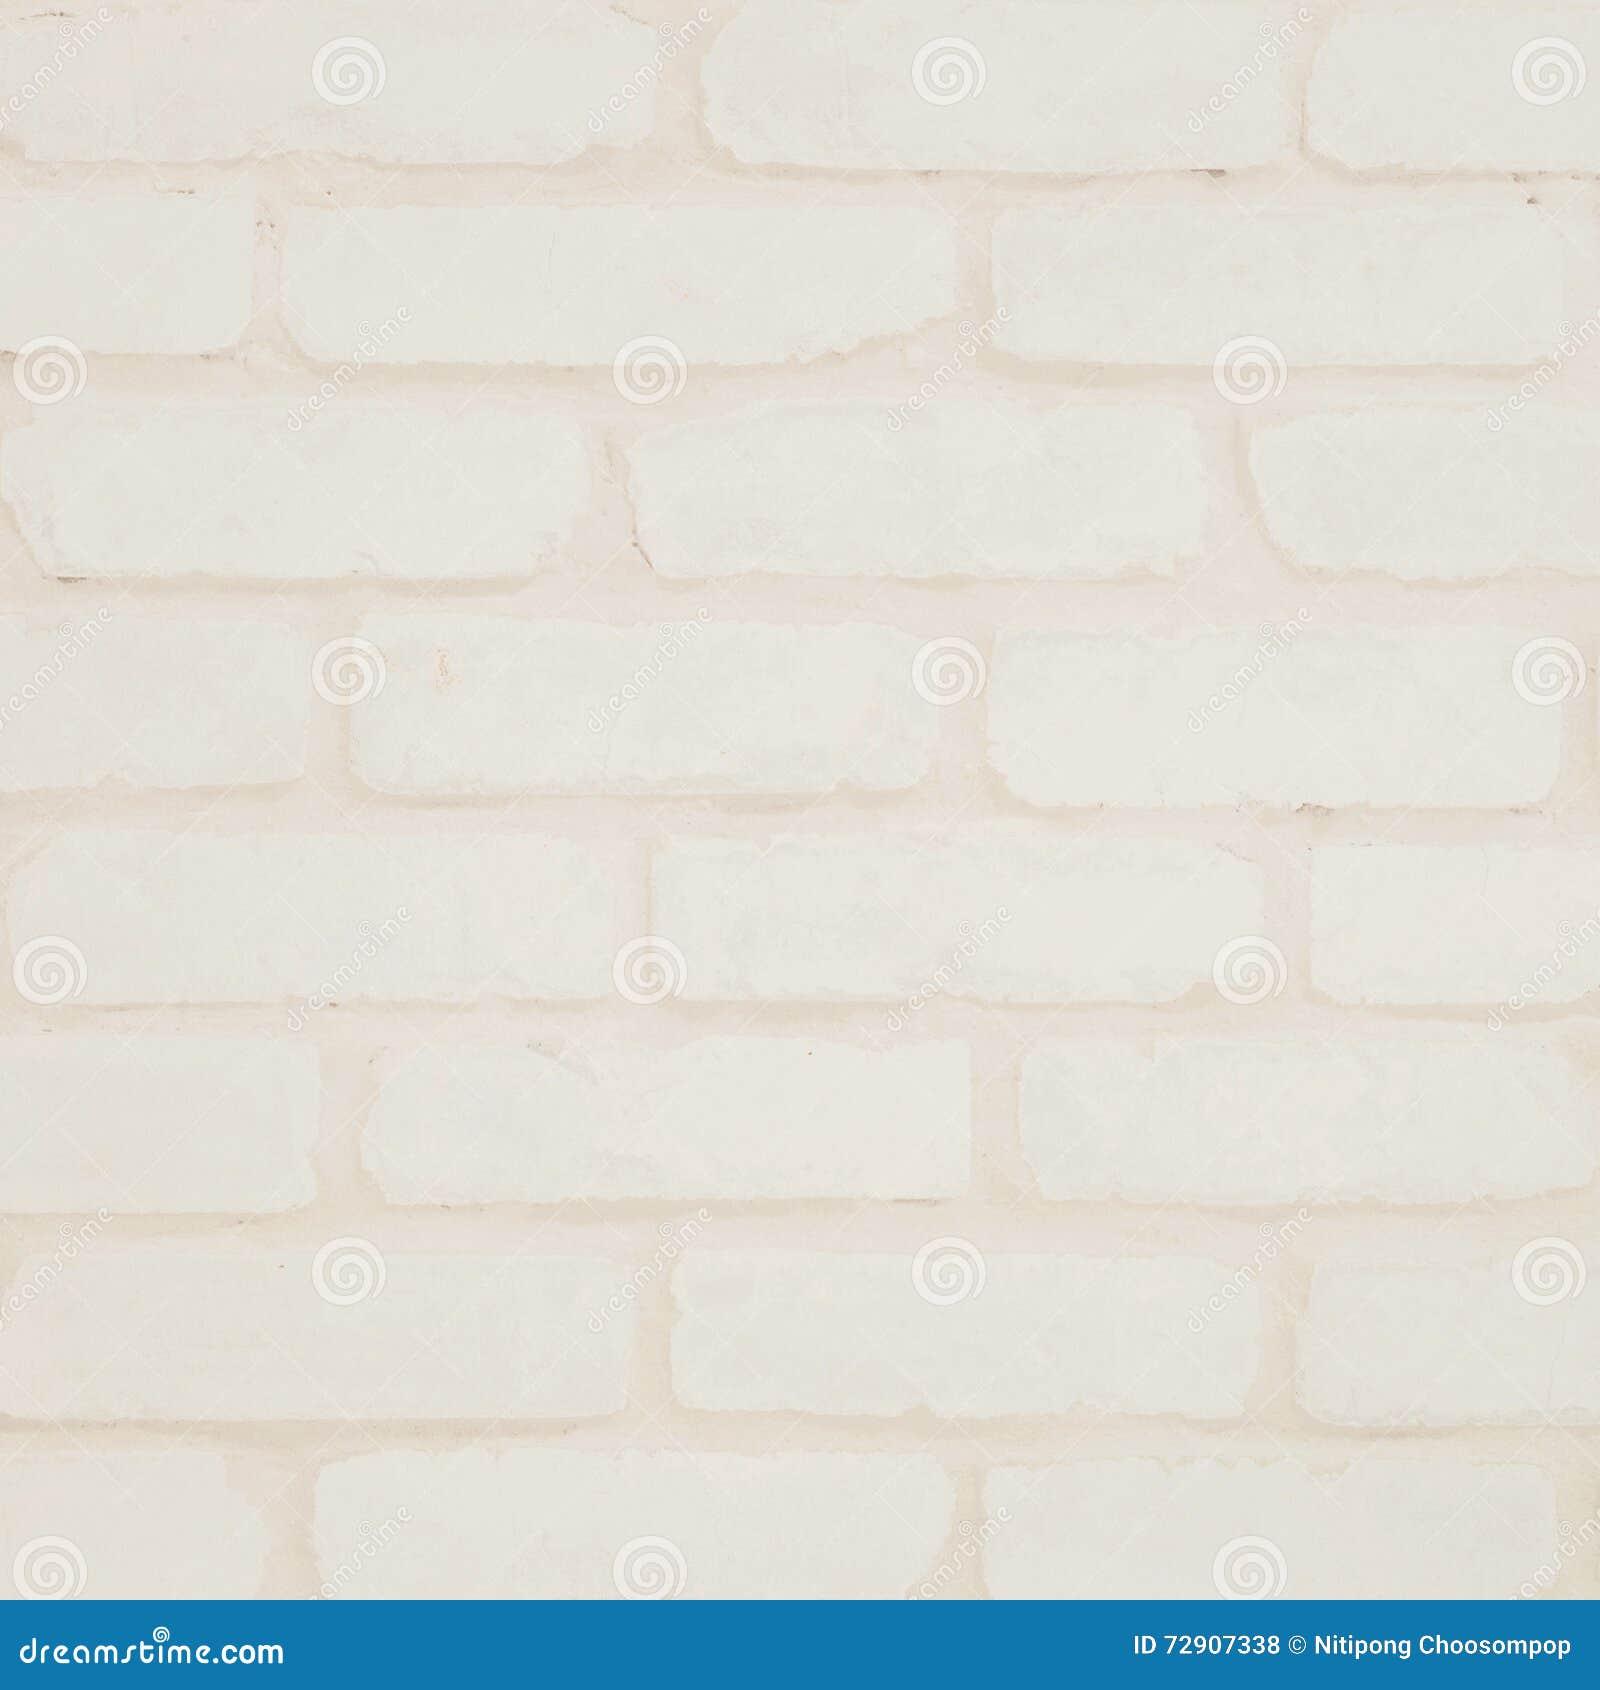 Brick cream background stock photo for Cream wallpaper for walls